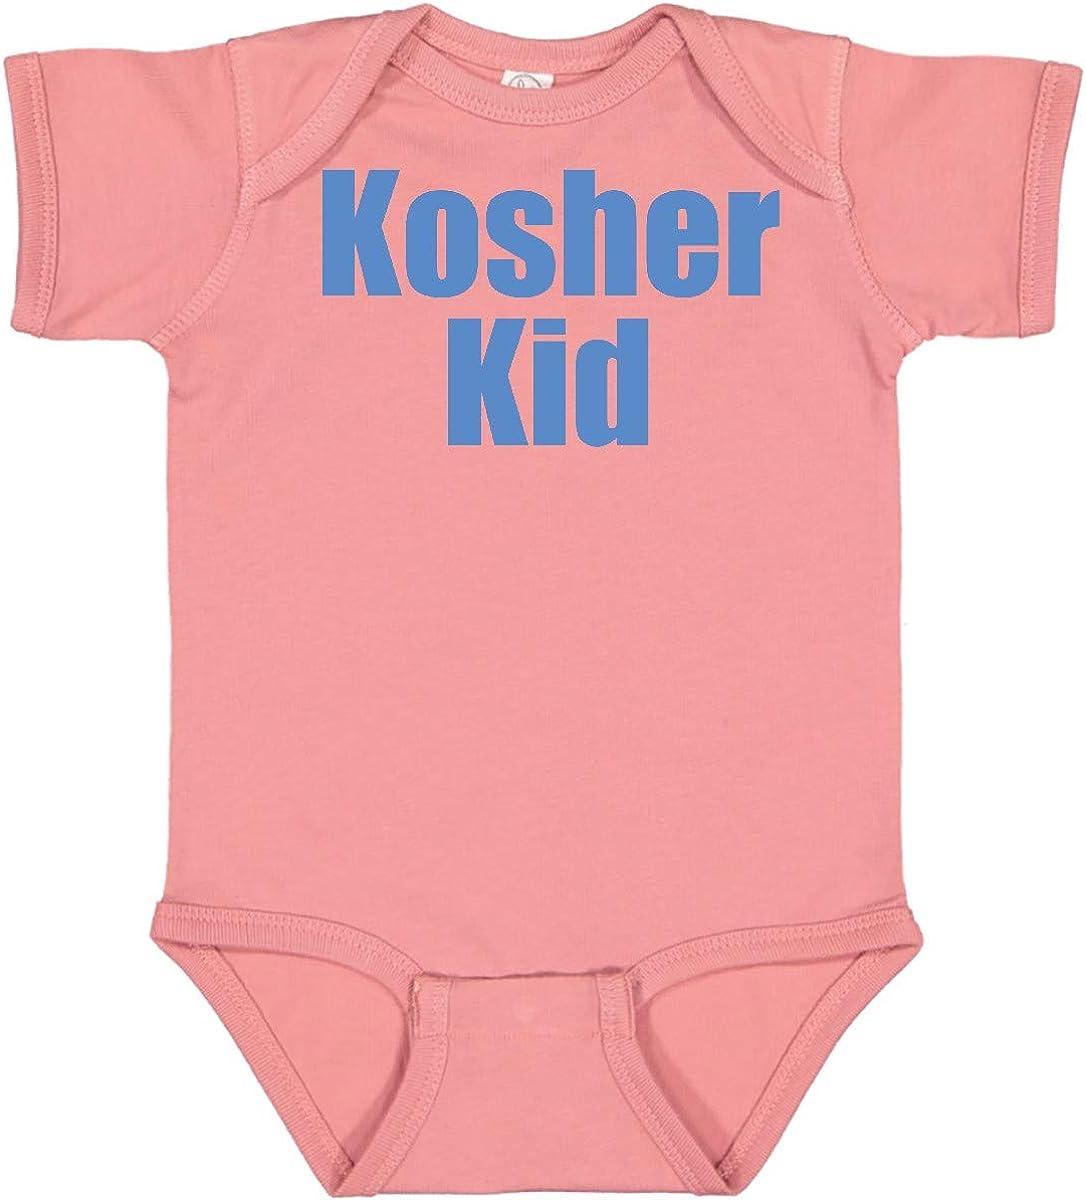 Max 46% Ranking TOP8 OFF inktastic Kosher Kid Creeper Infant